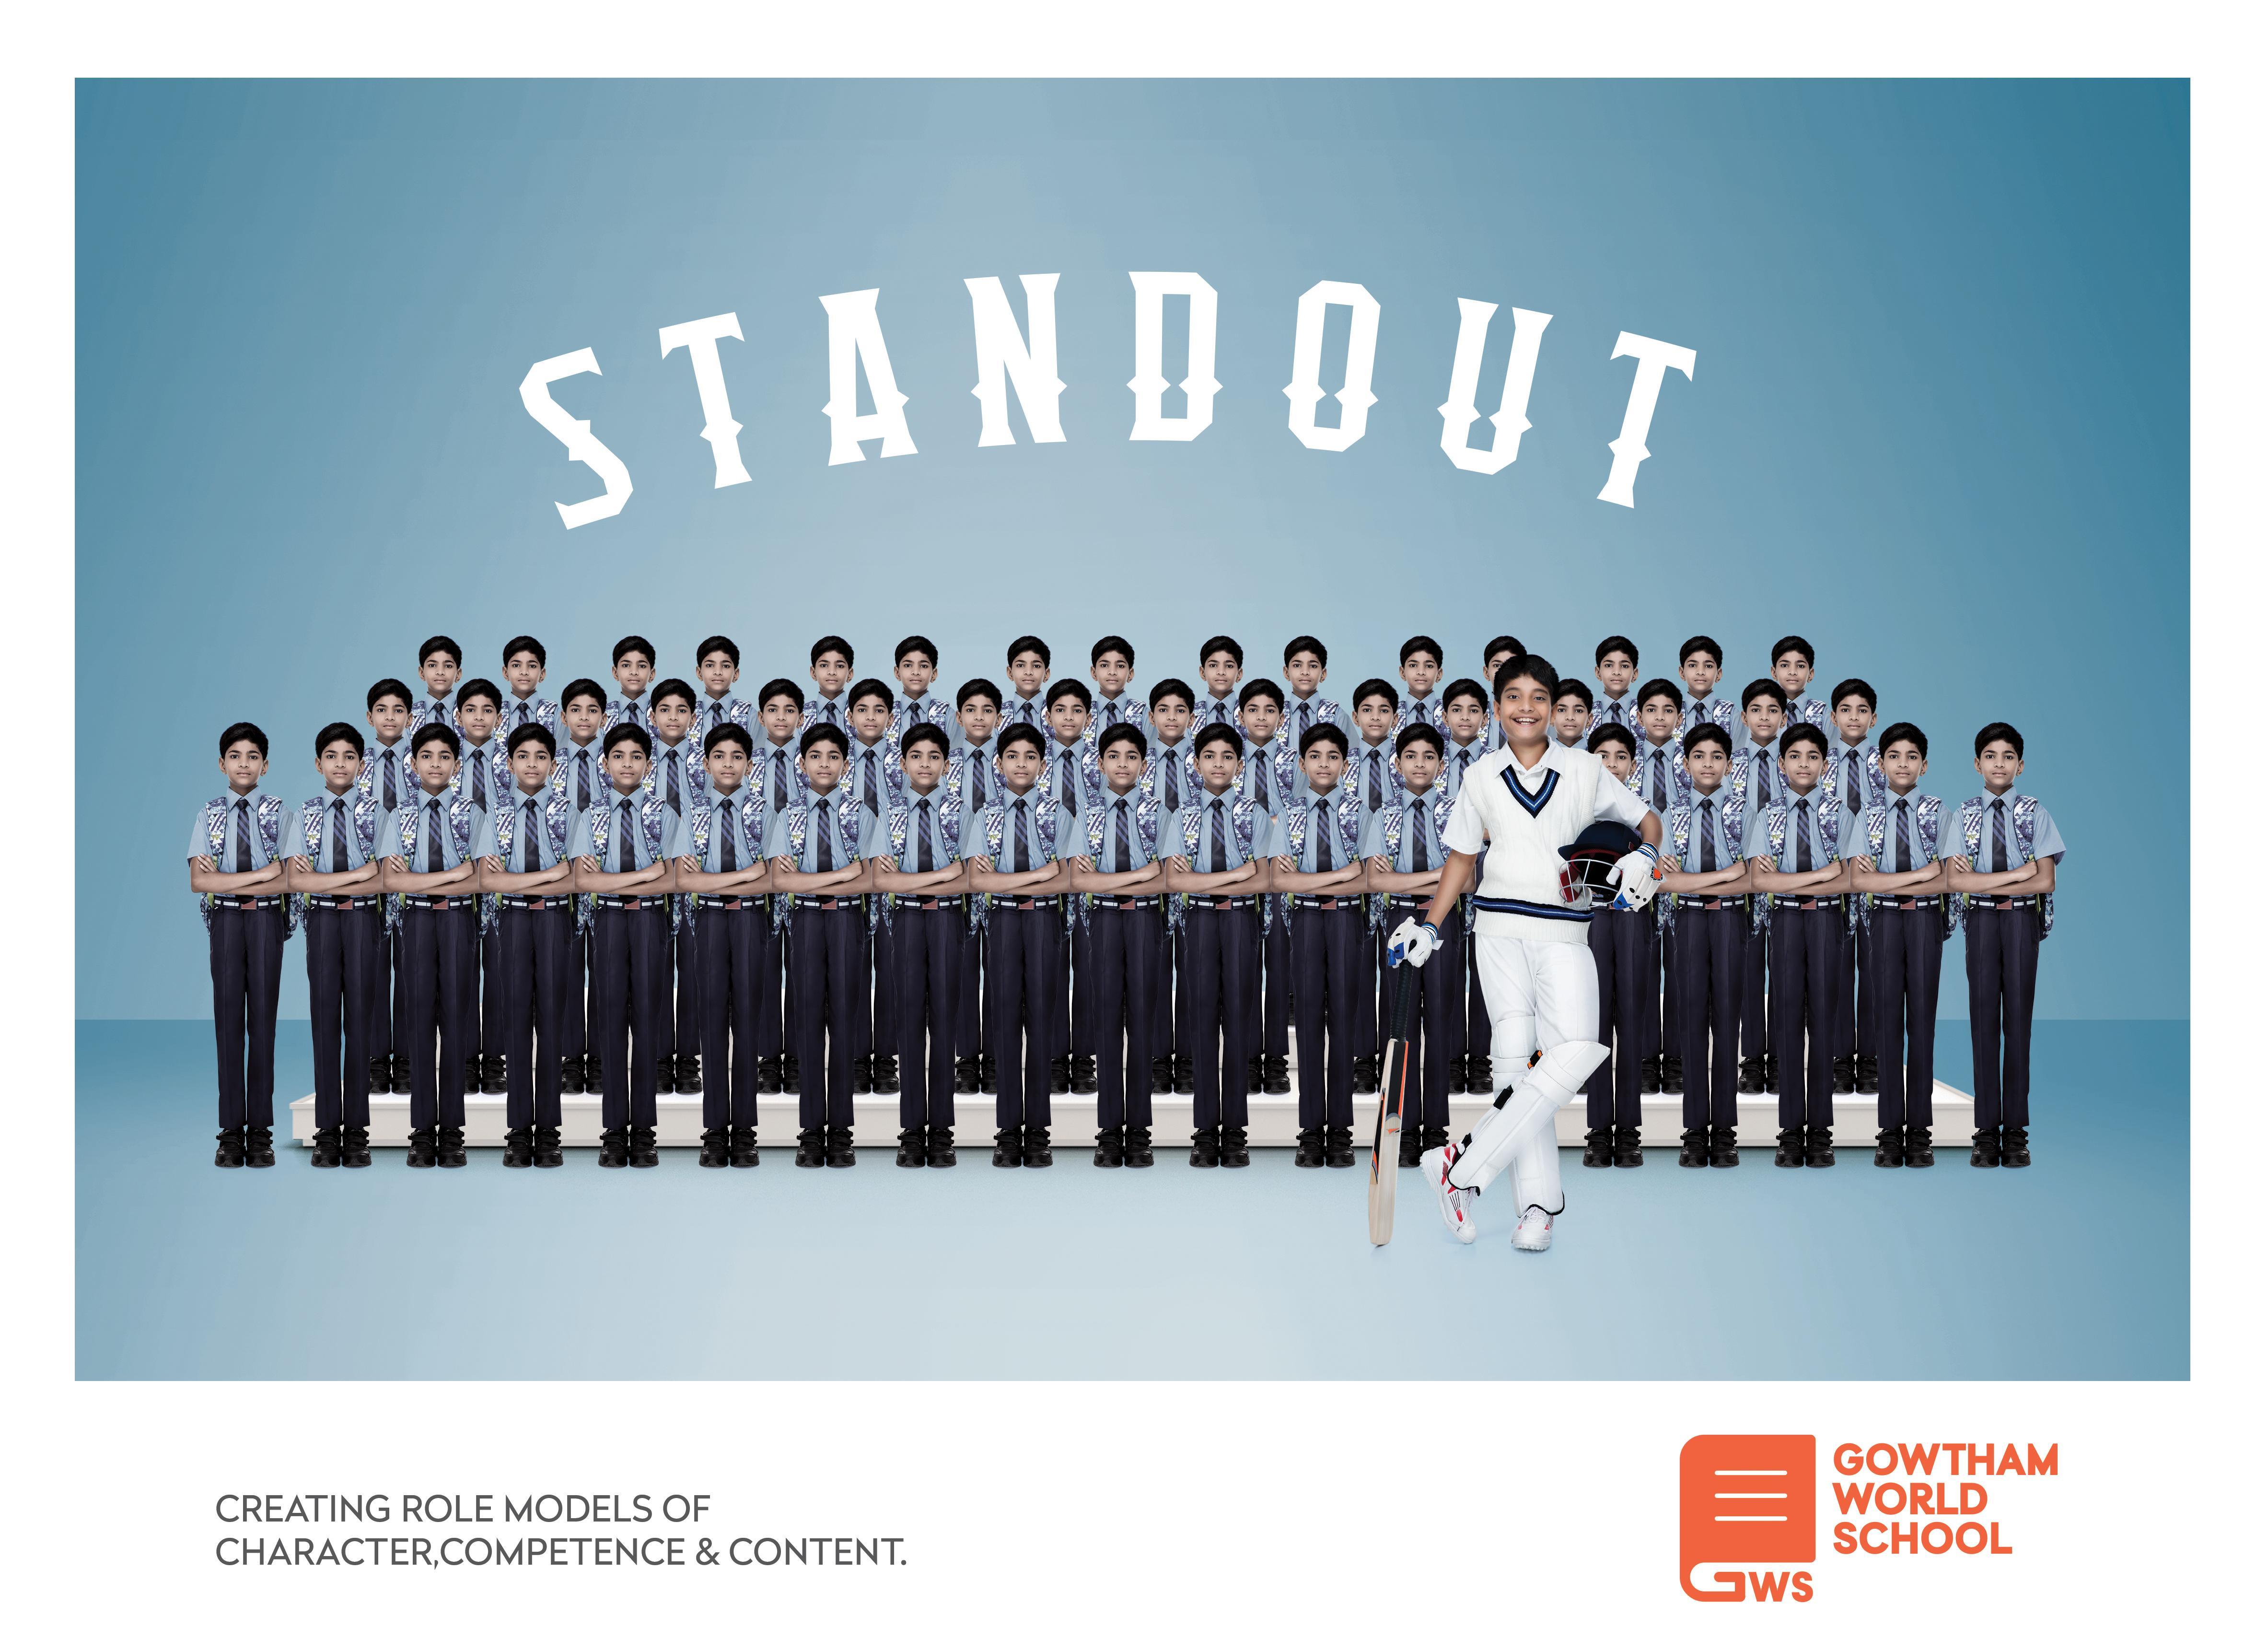 Gowtham World School Print Ad - Cricketer